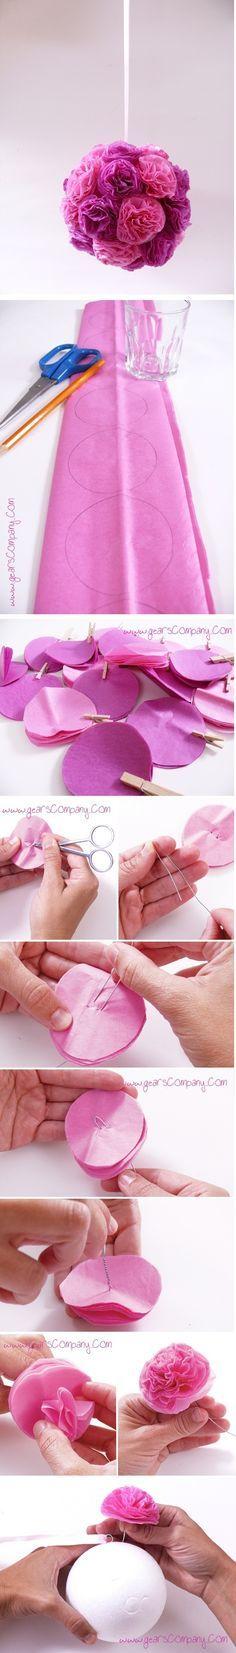 rosetones con flores formadas con papel de china